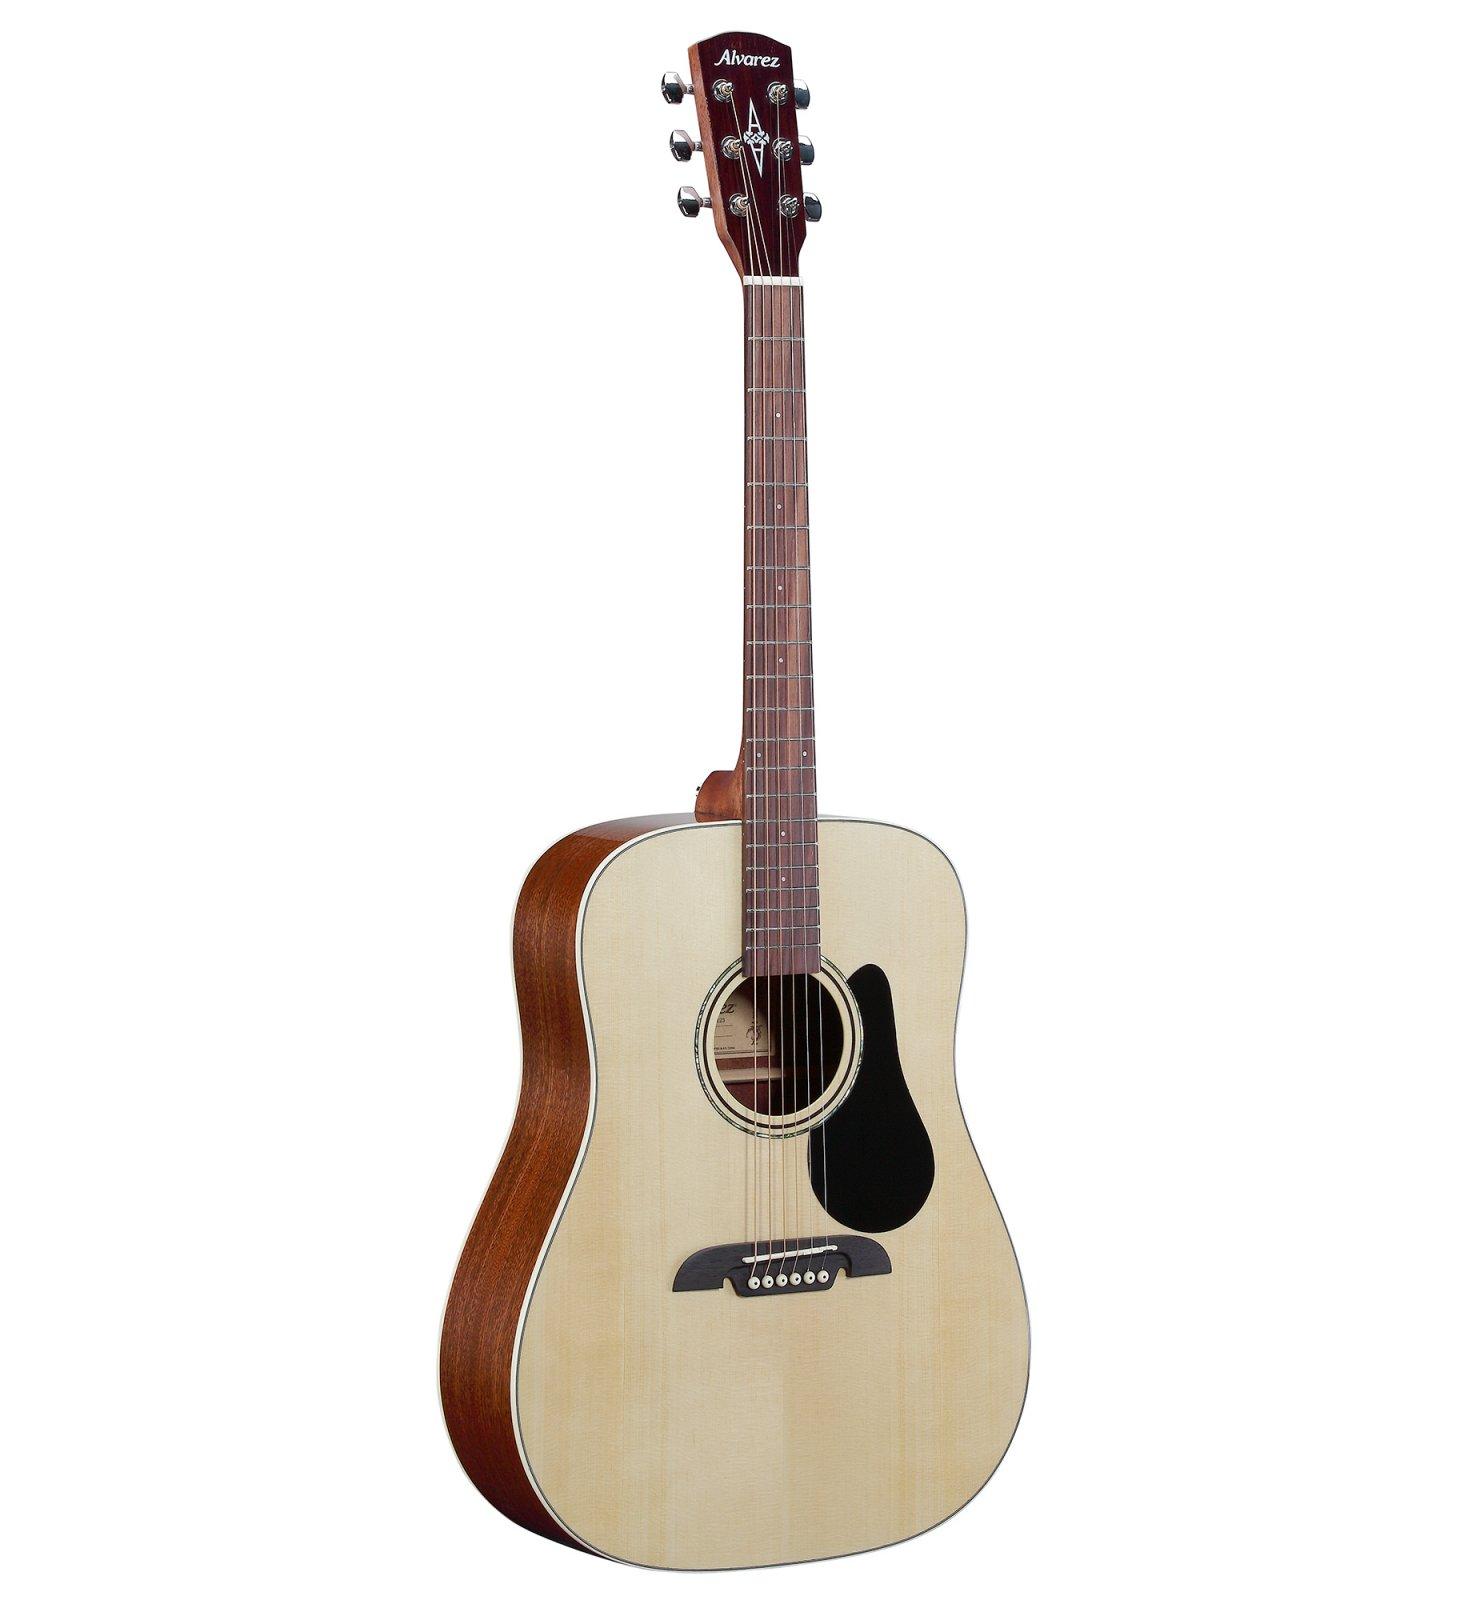 Alvarez RD26 Regent Series Dreadnought Acoustic Guitar with Gigbag